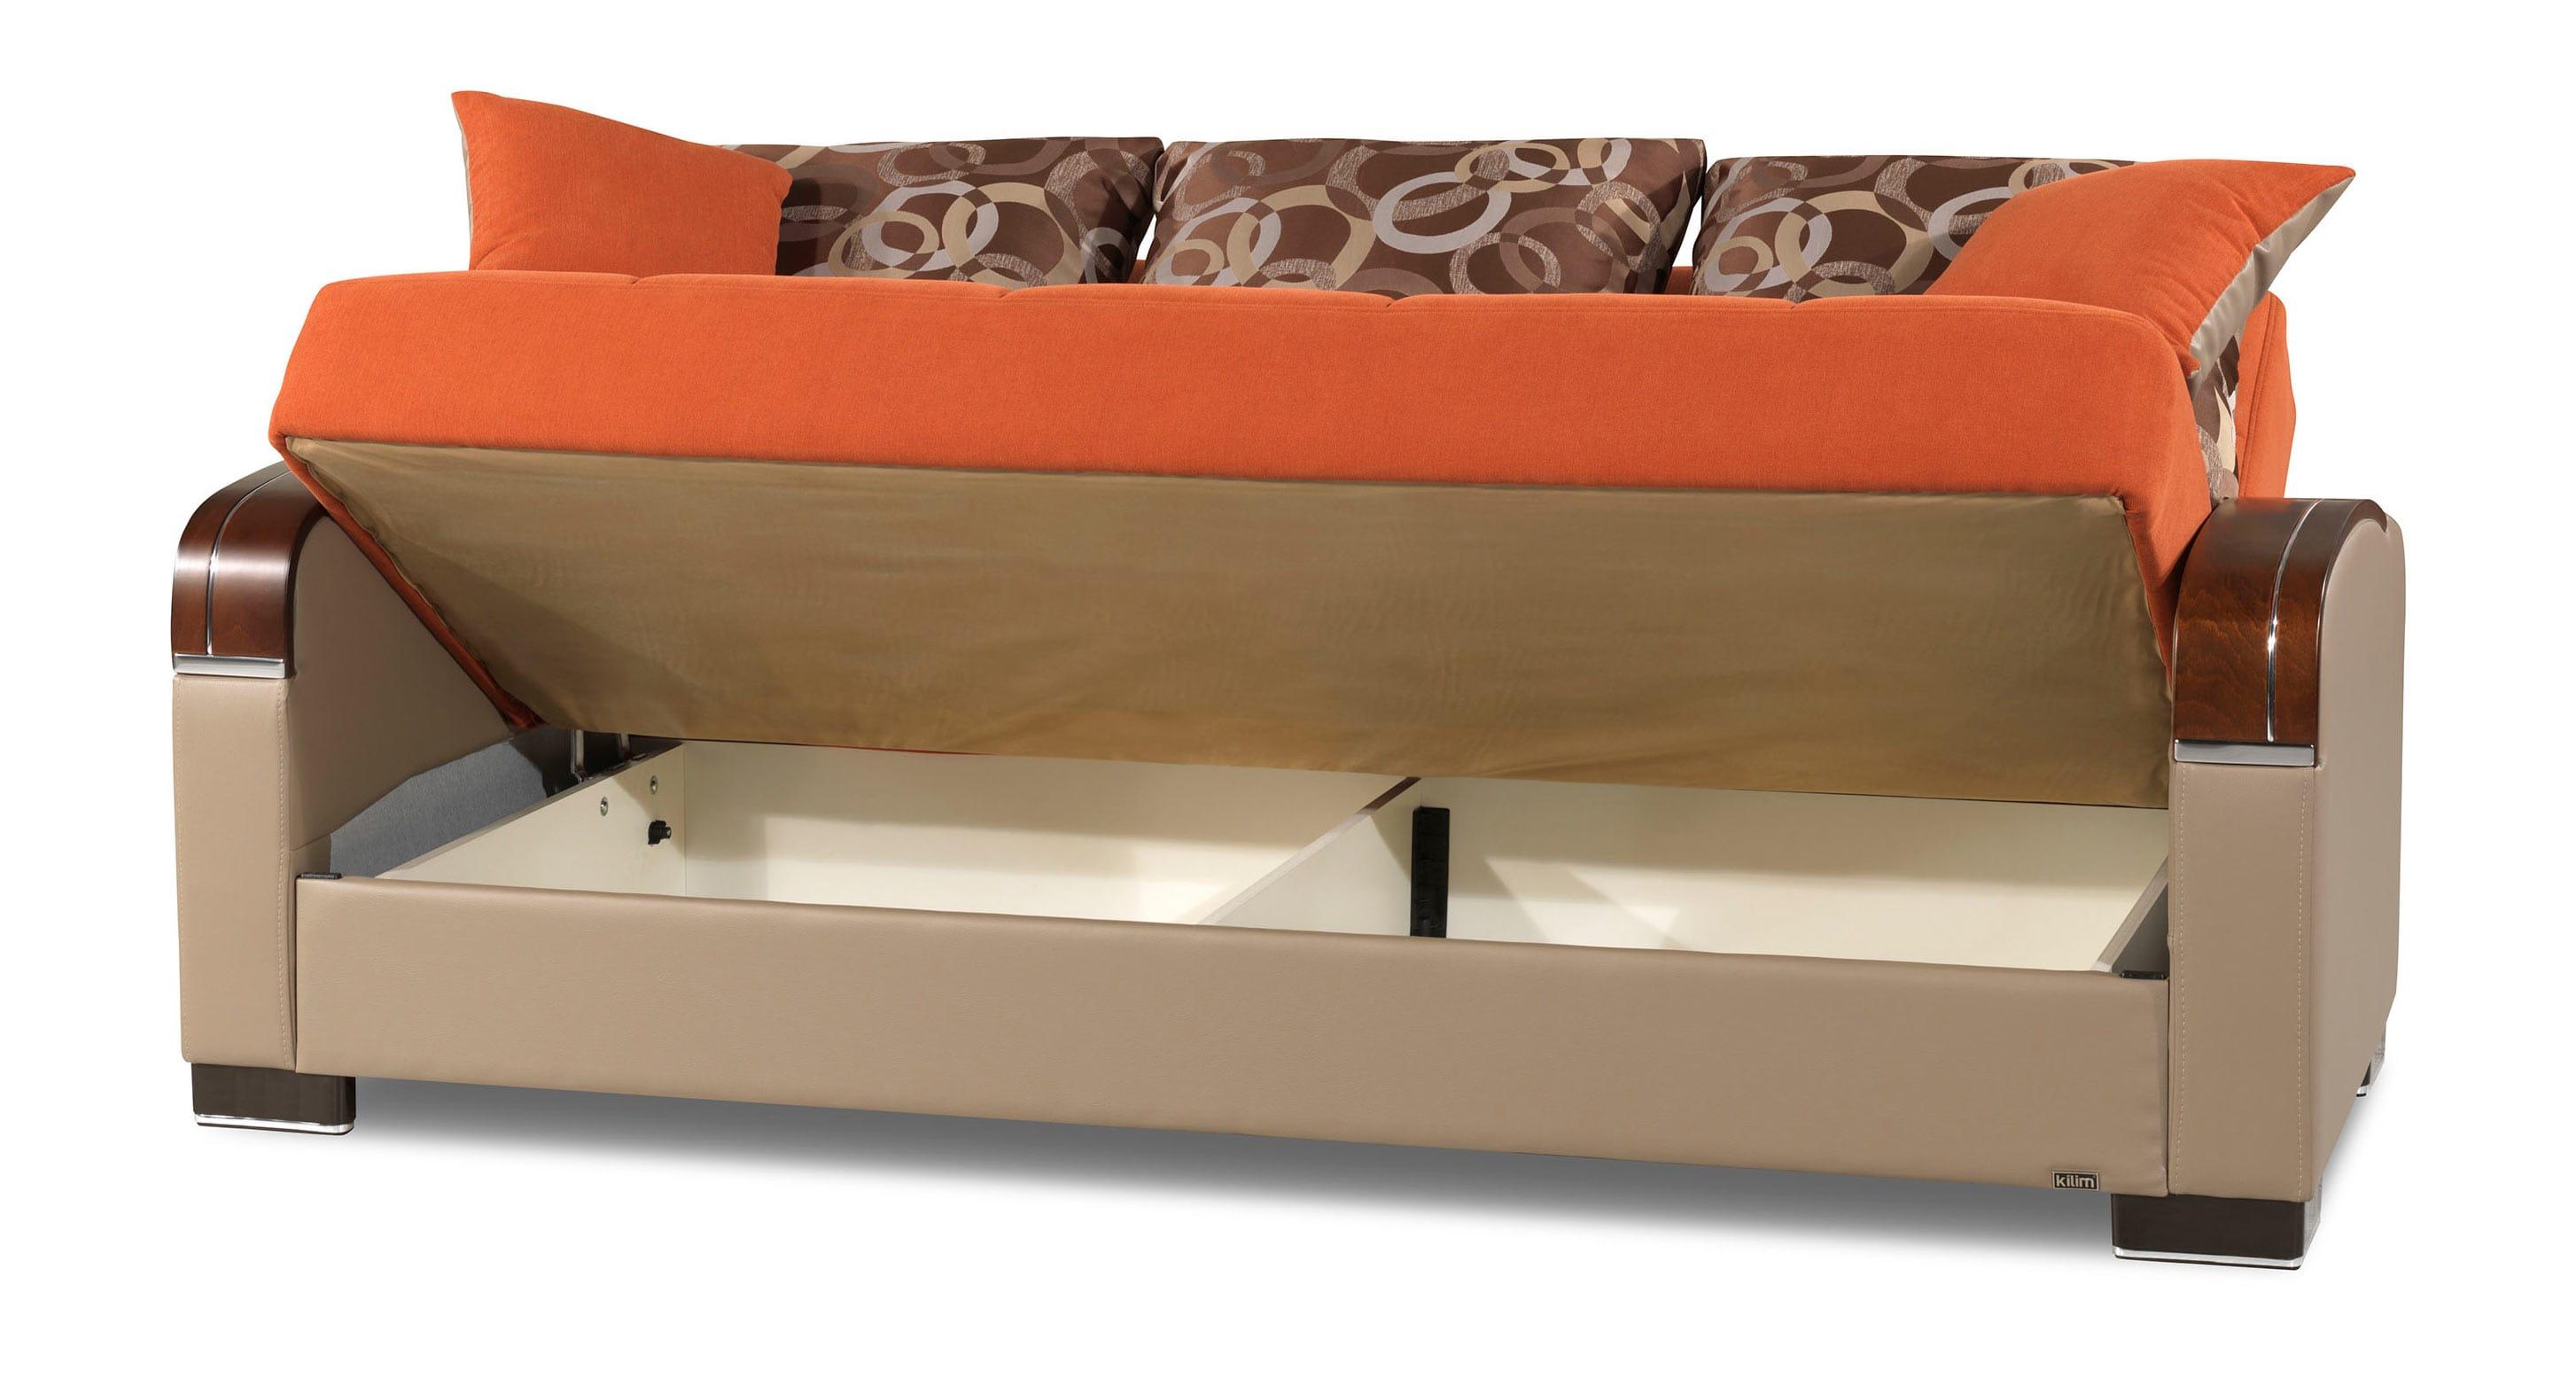 Cool Mobimax Orange Convertible Sofa Bed By Casamode Inzonedesignstudio Interior Chair Design Inzonedesignstudiocom